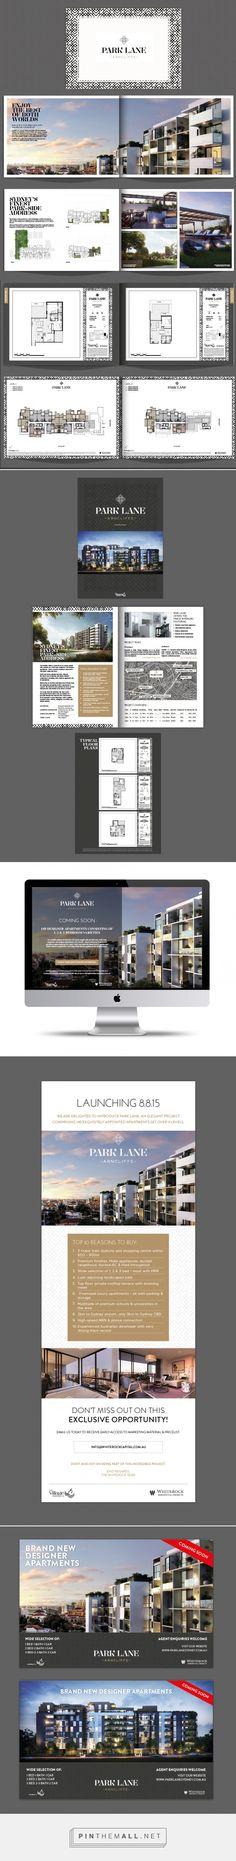 Real Estate Brochure on Behance Brochure Designs Pinterest - real estate brochure template